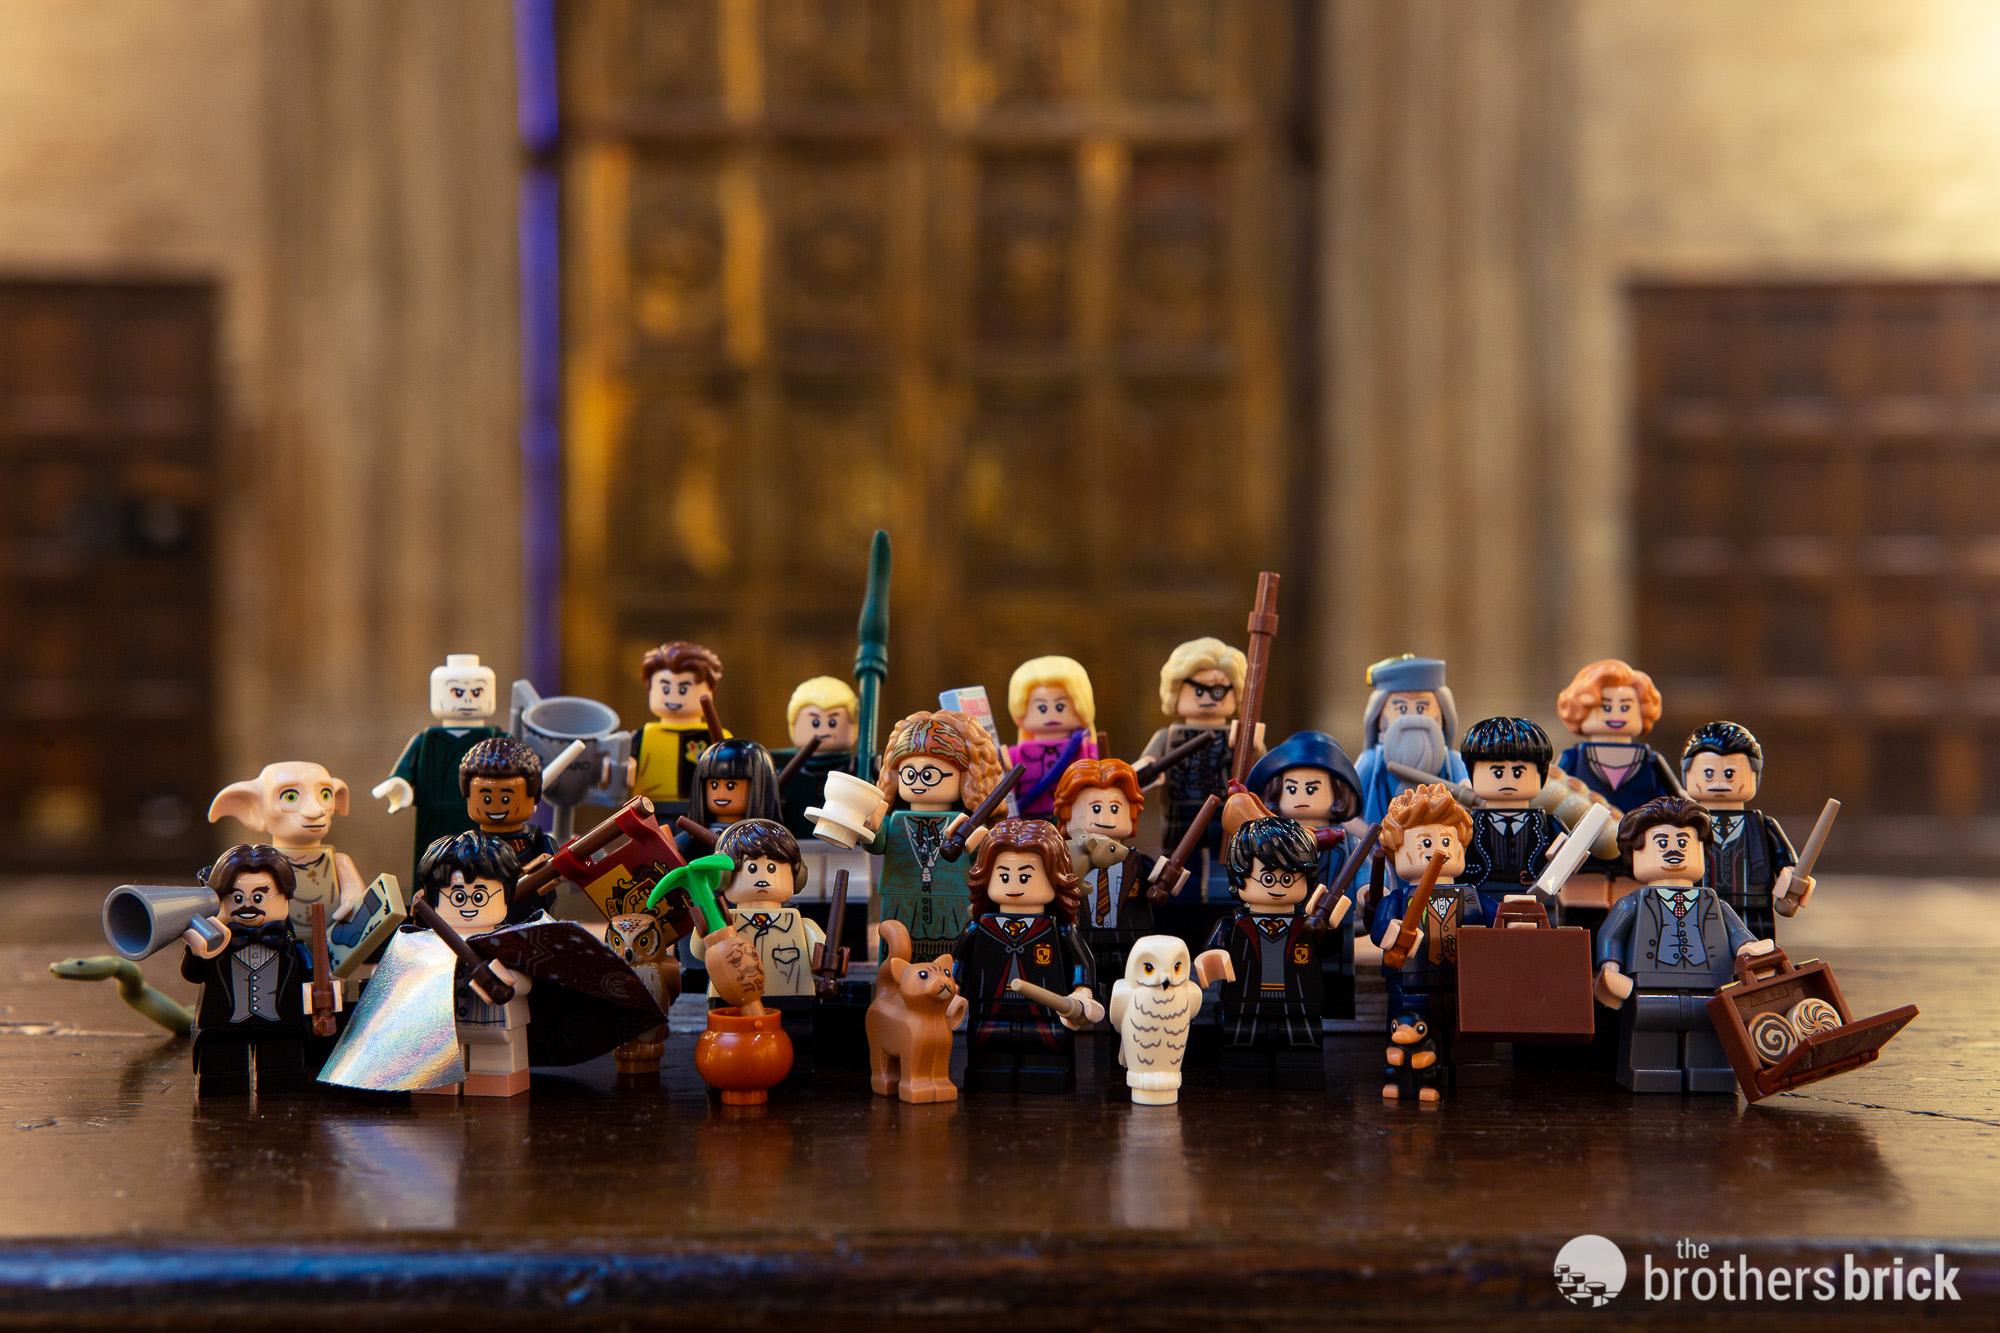 Lego 71022 Wizarding World Of Harry Potter Minifigure